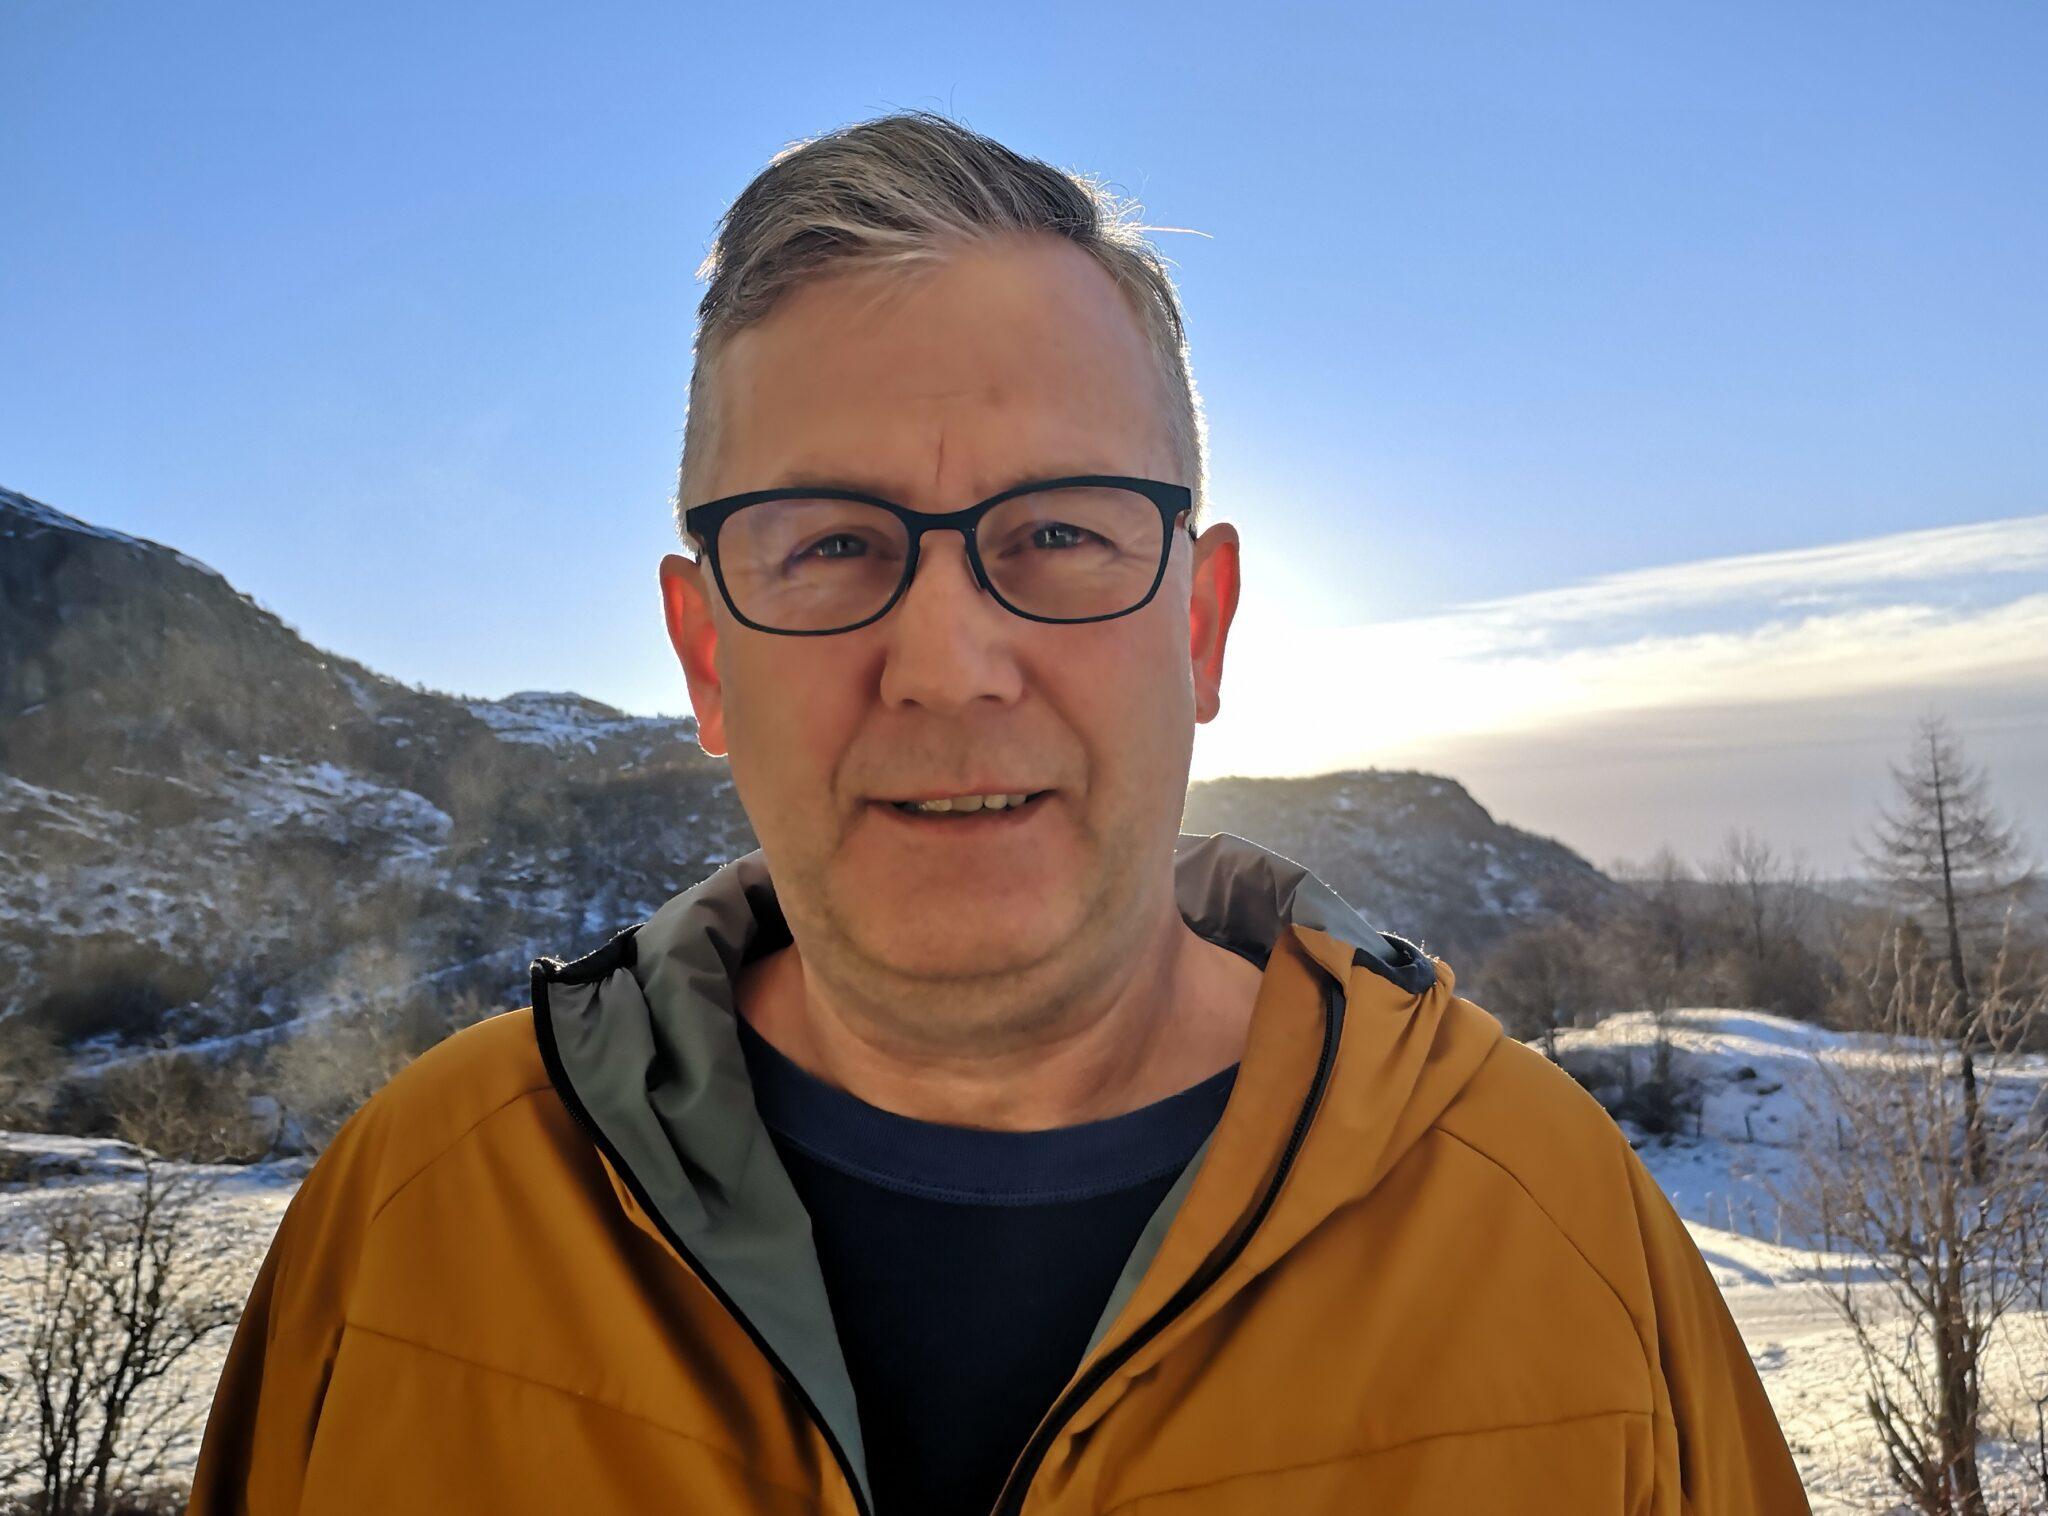 Kjell Andreas Heskestad